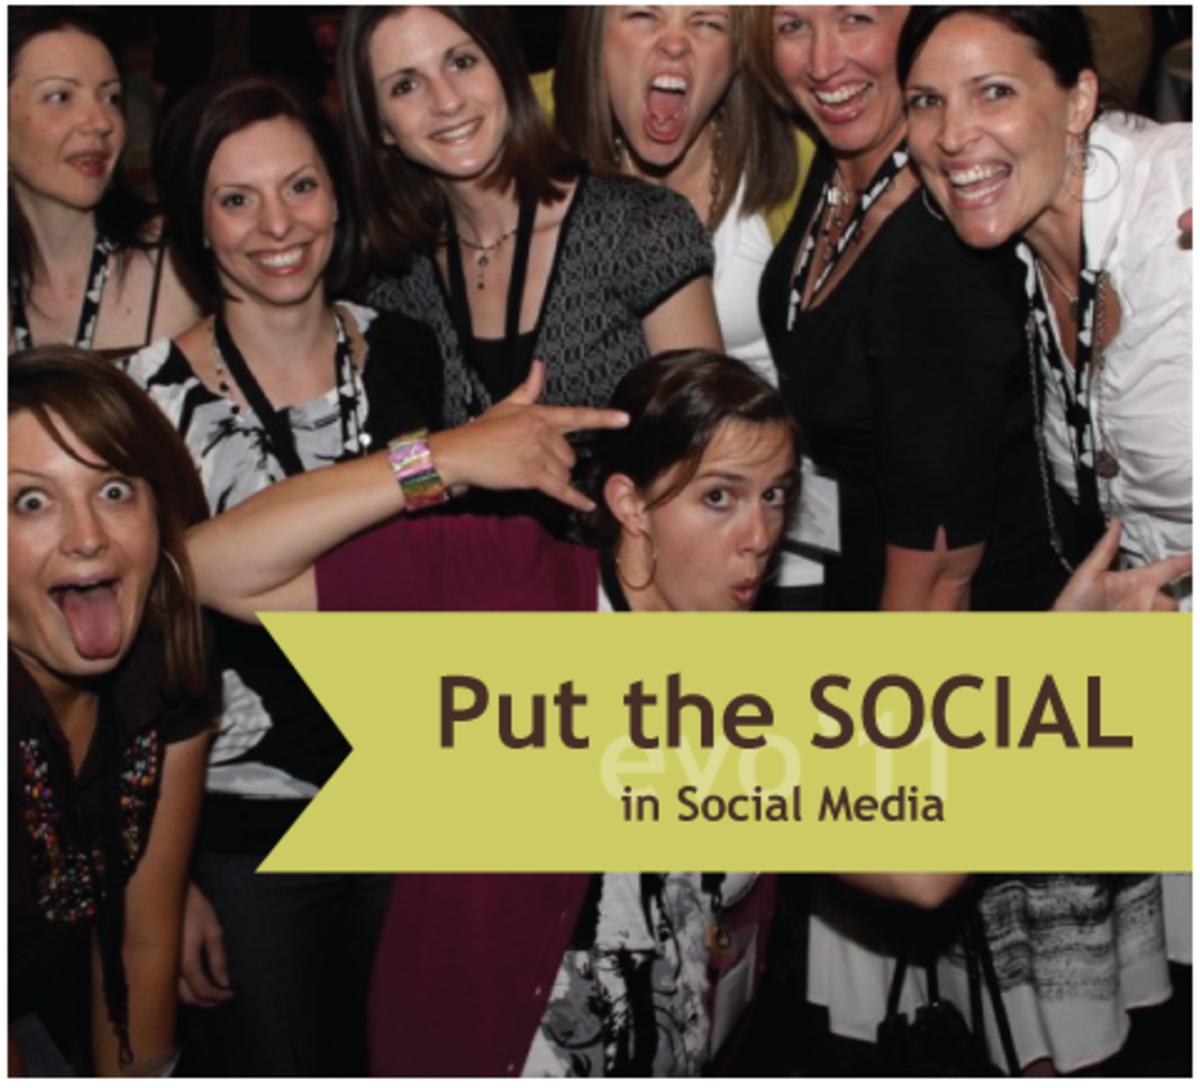 social media conference for women